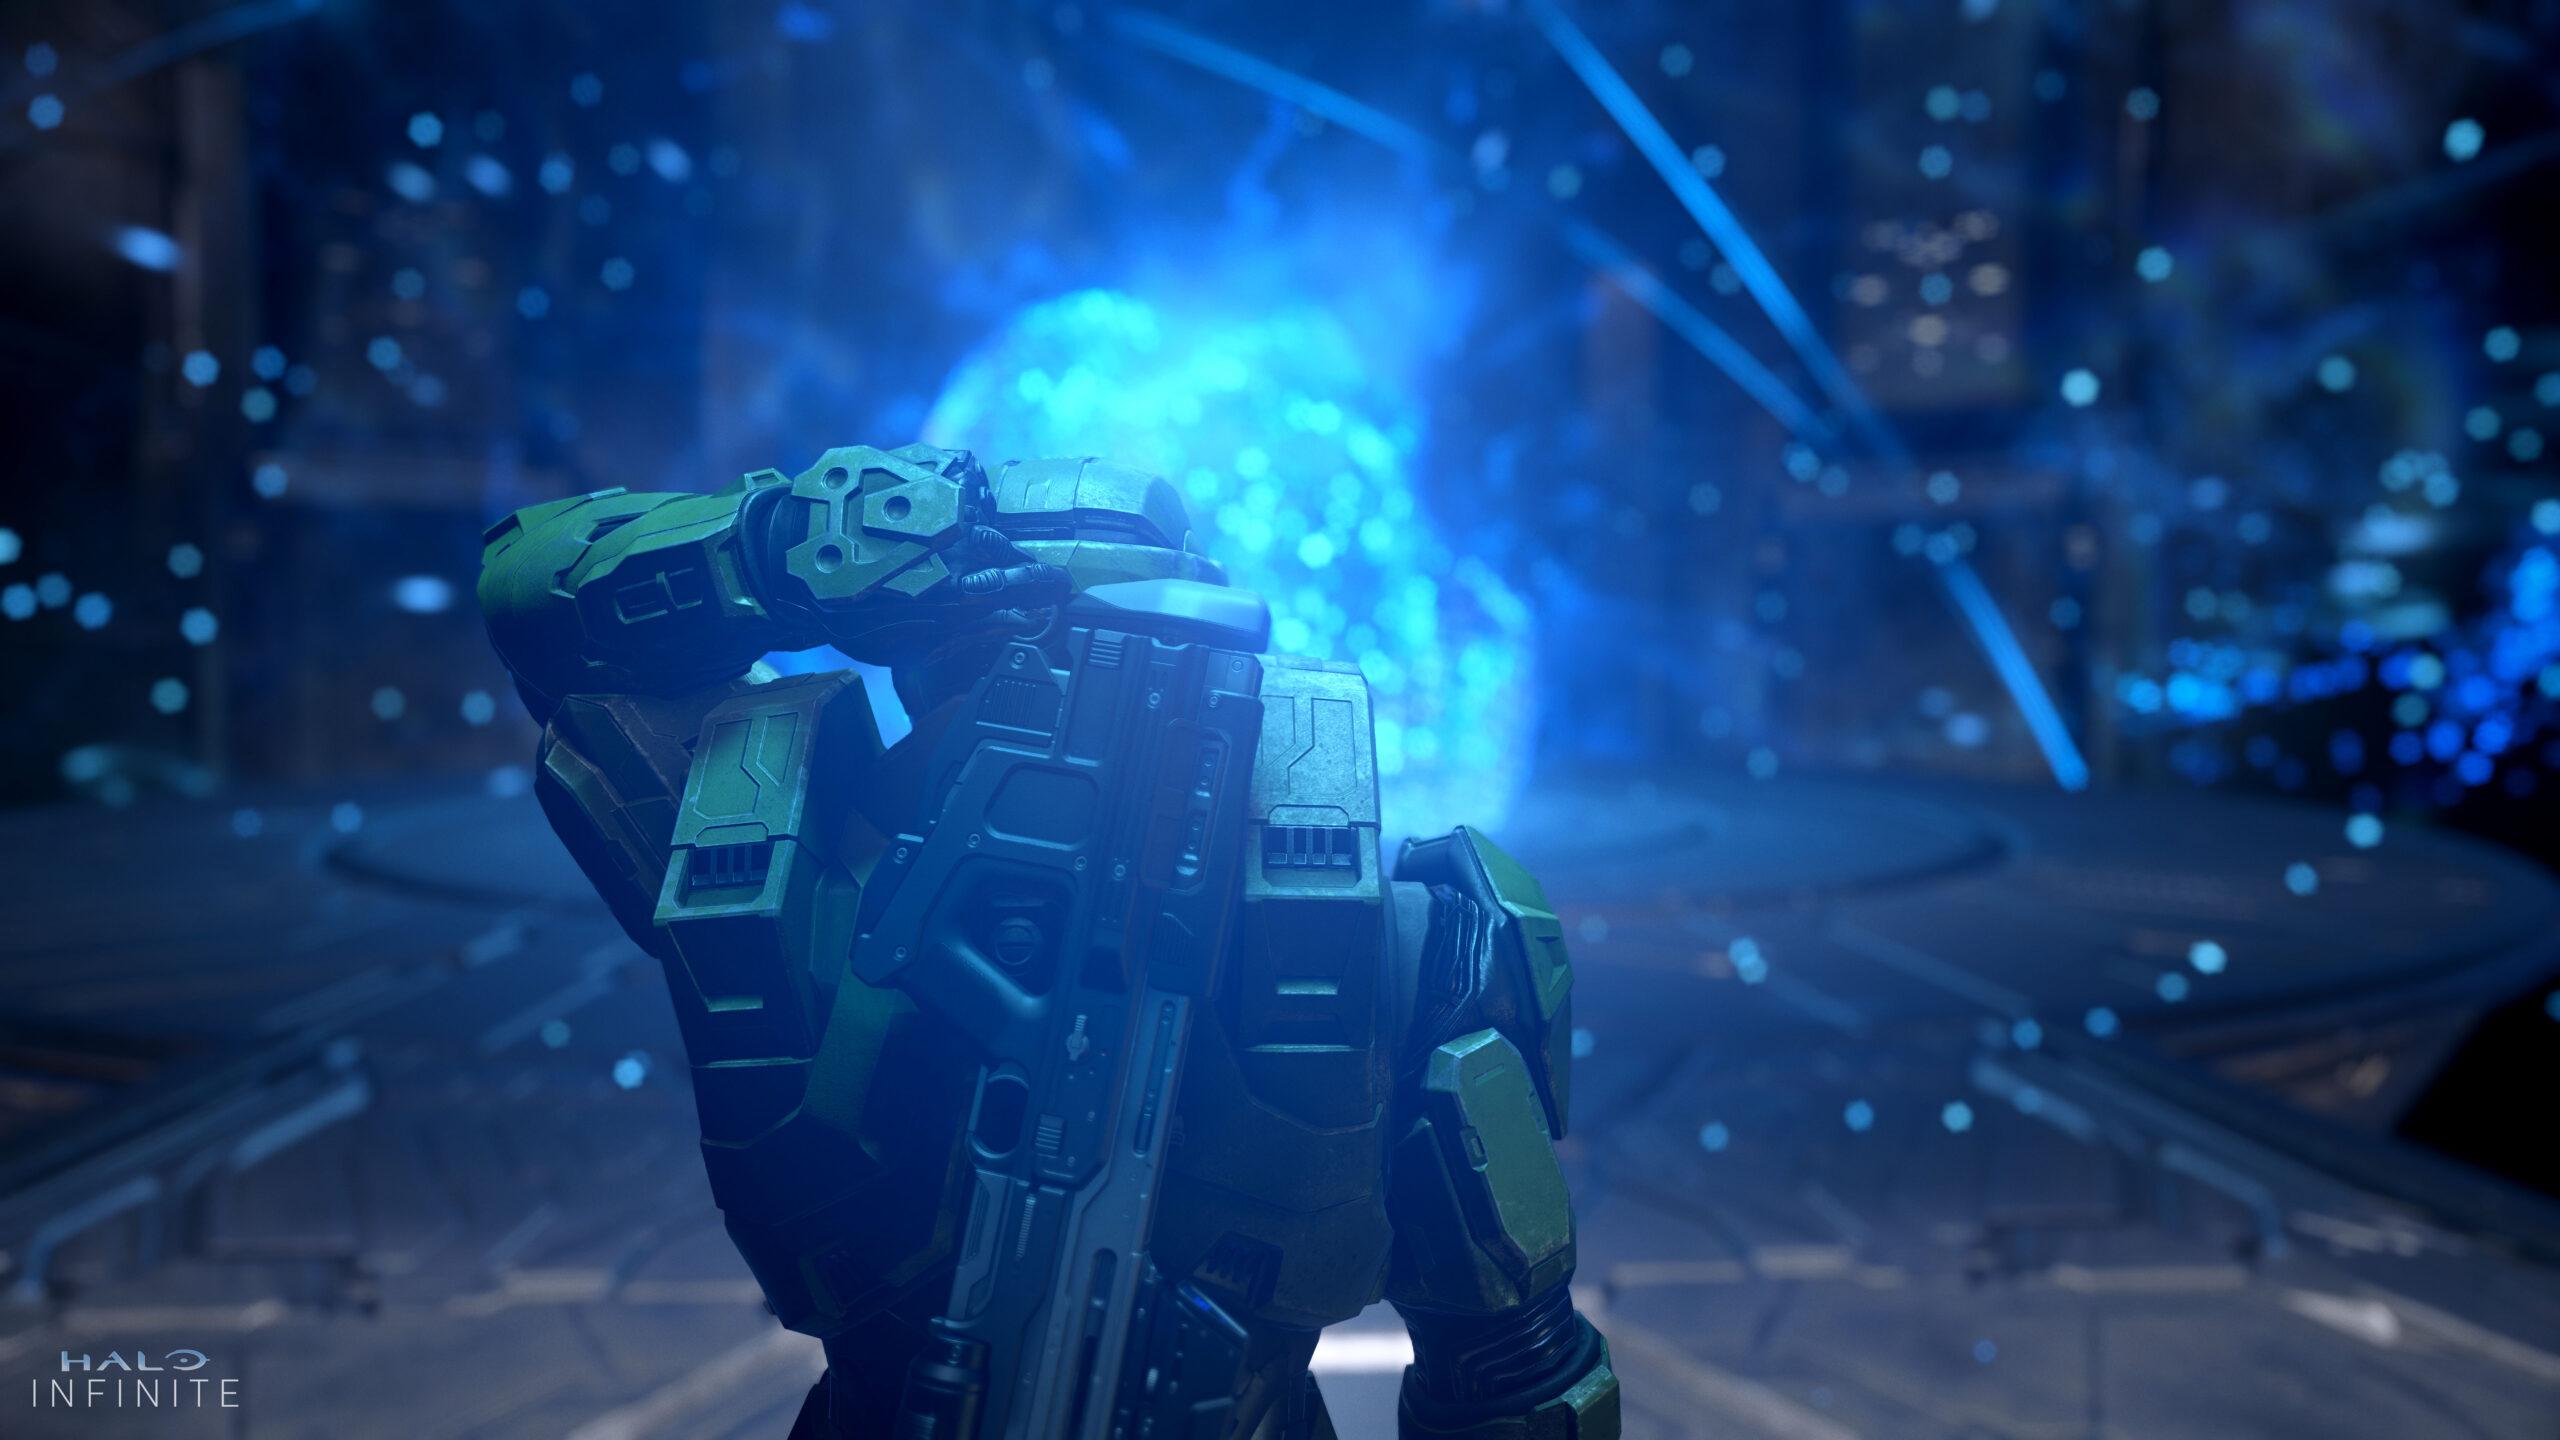 Halo-Infinite_2019_06-09-19_002